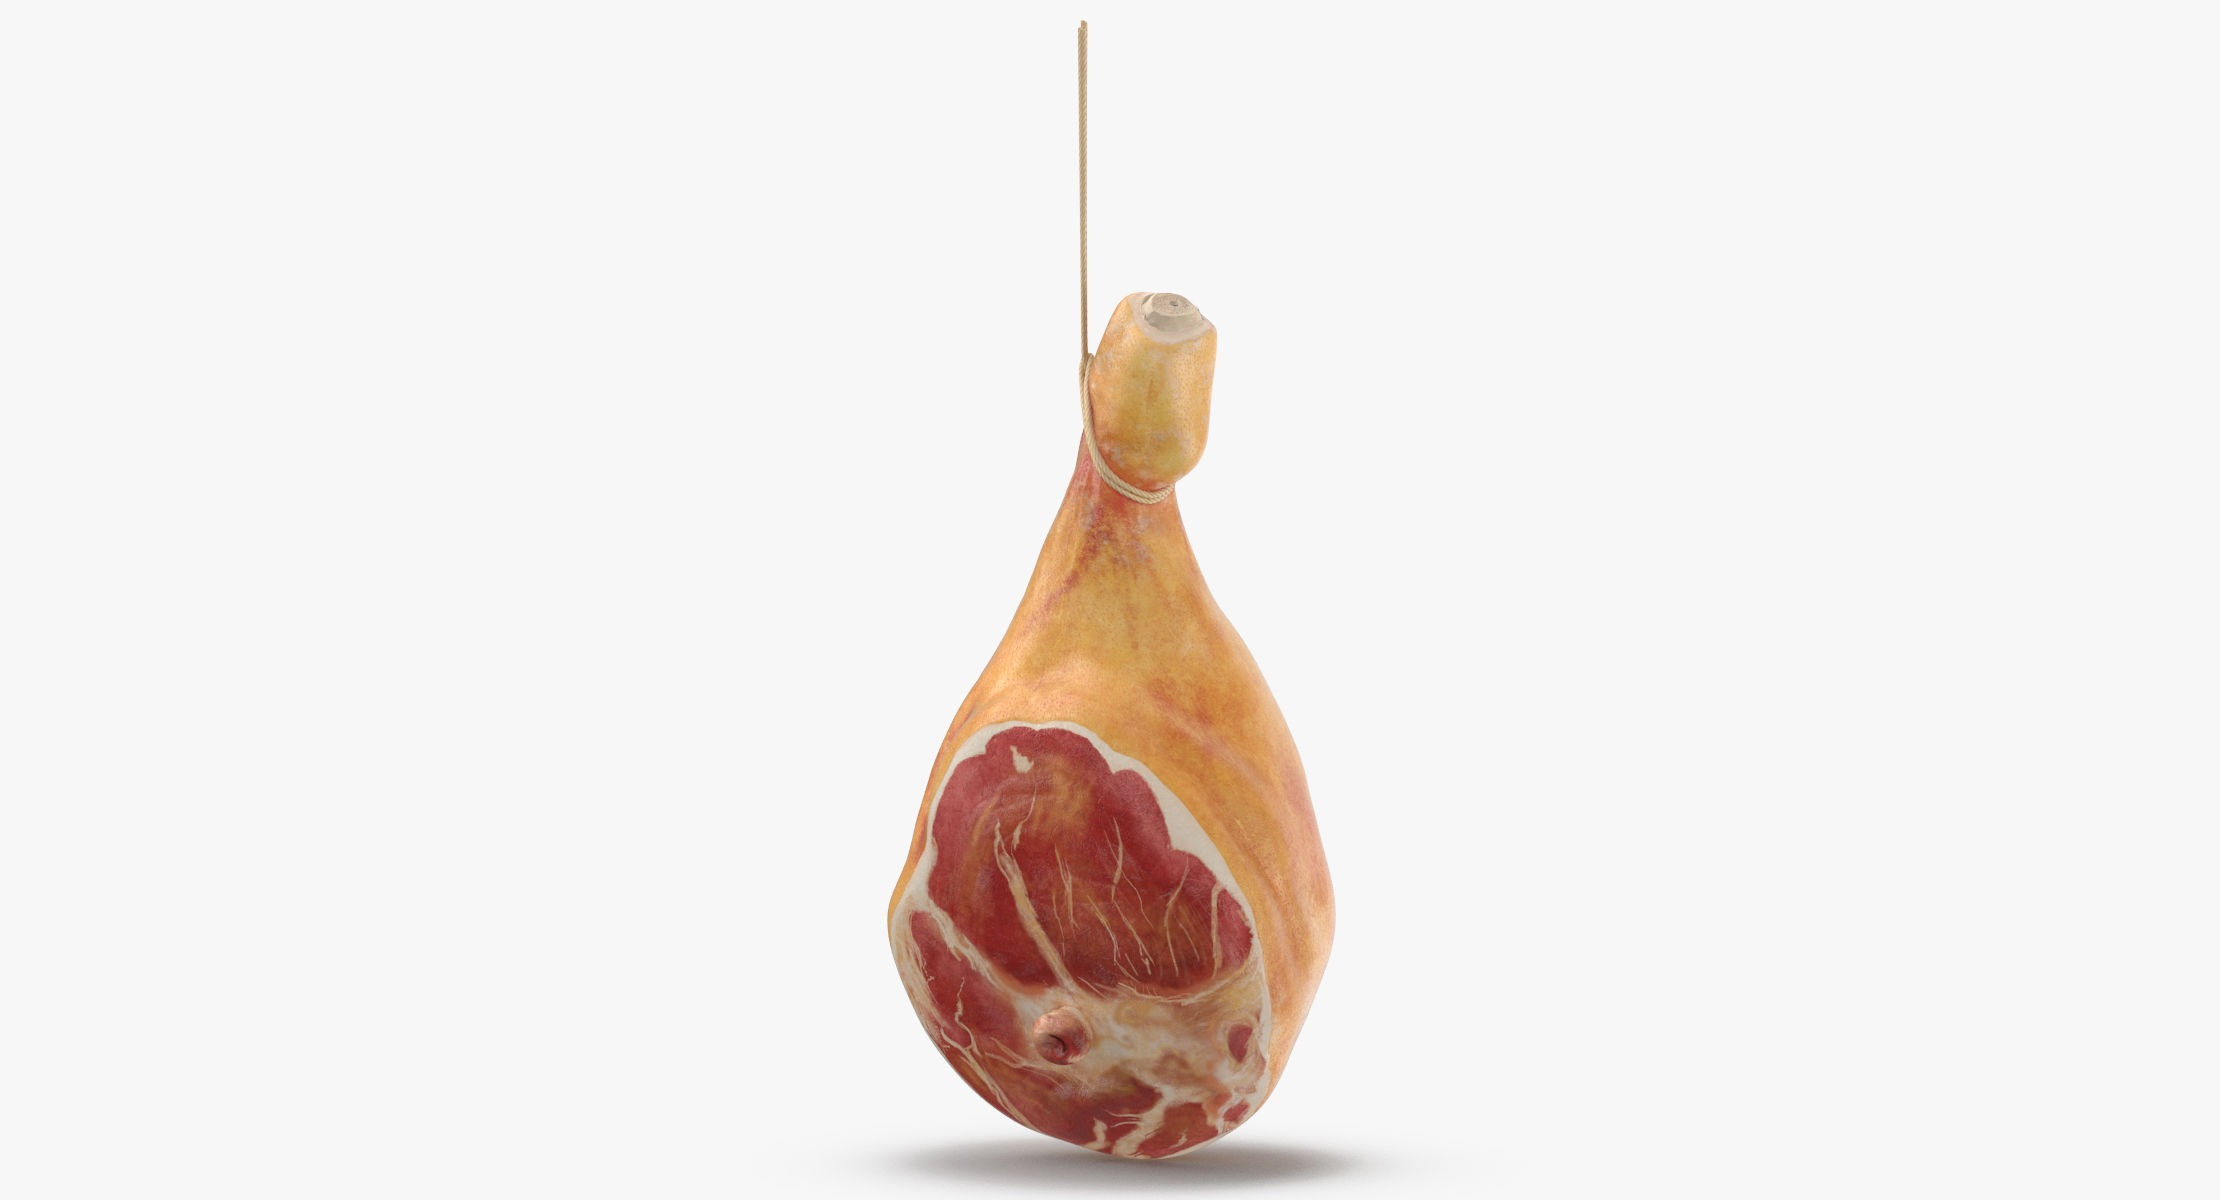 Hanging Ham 02 - reel 1